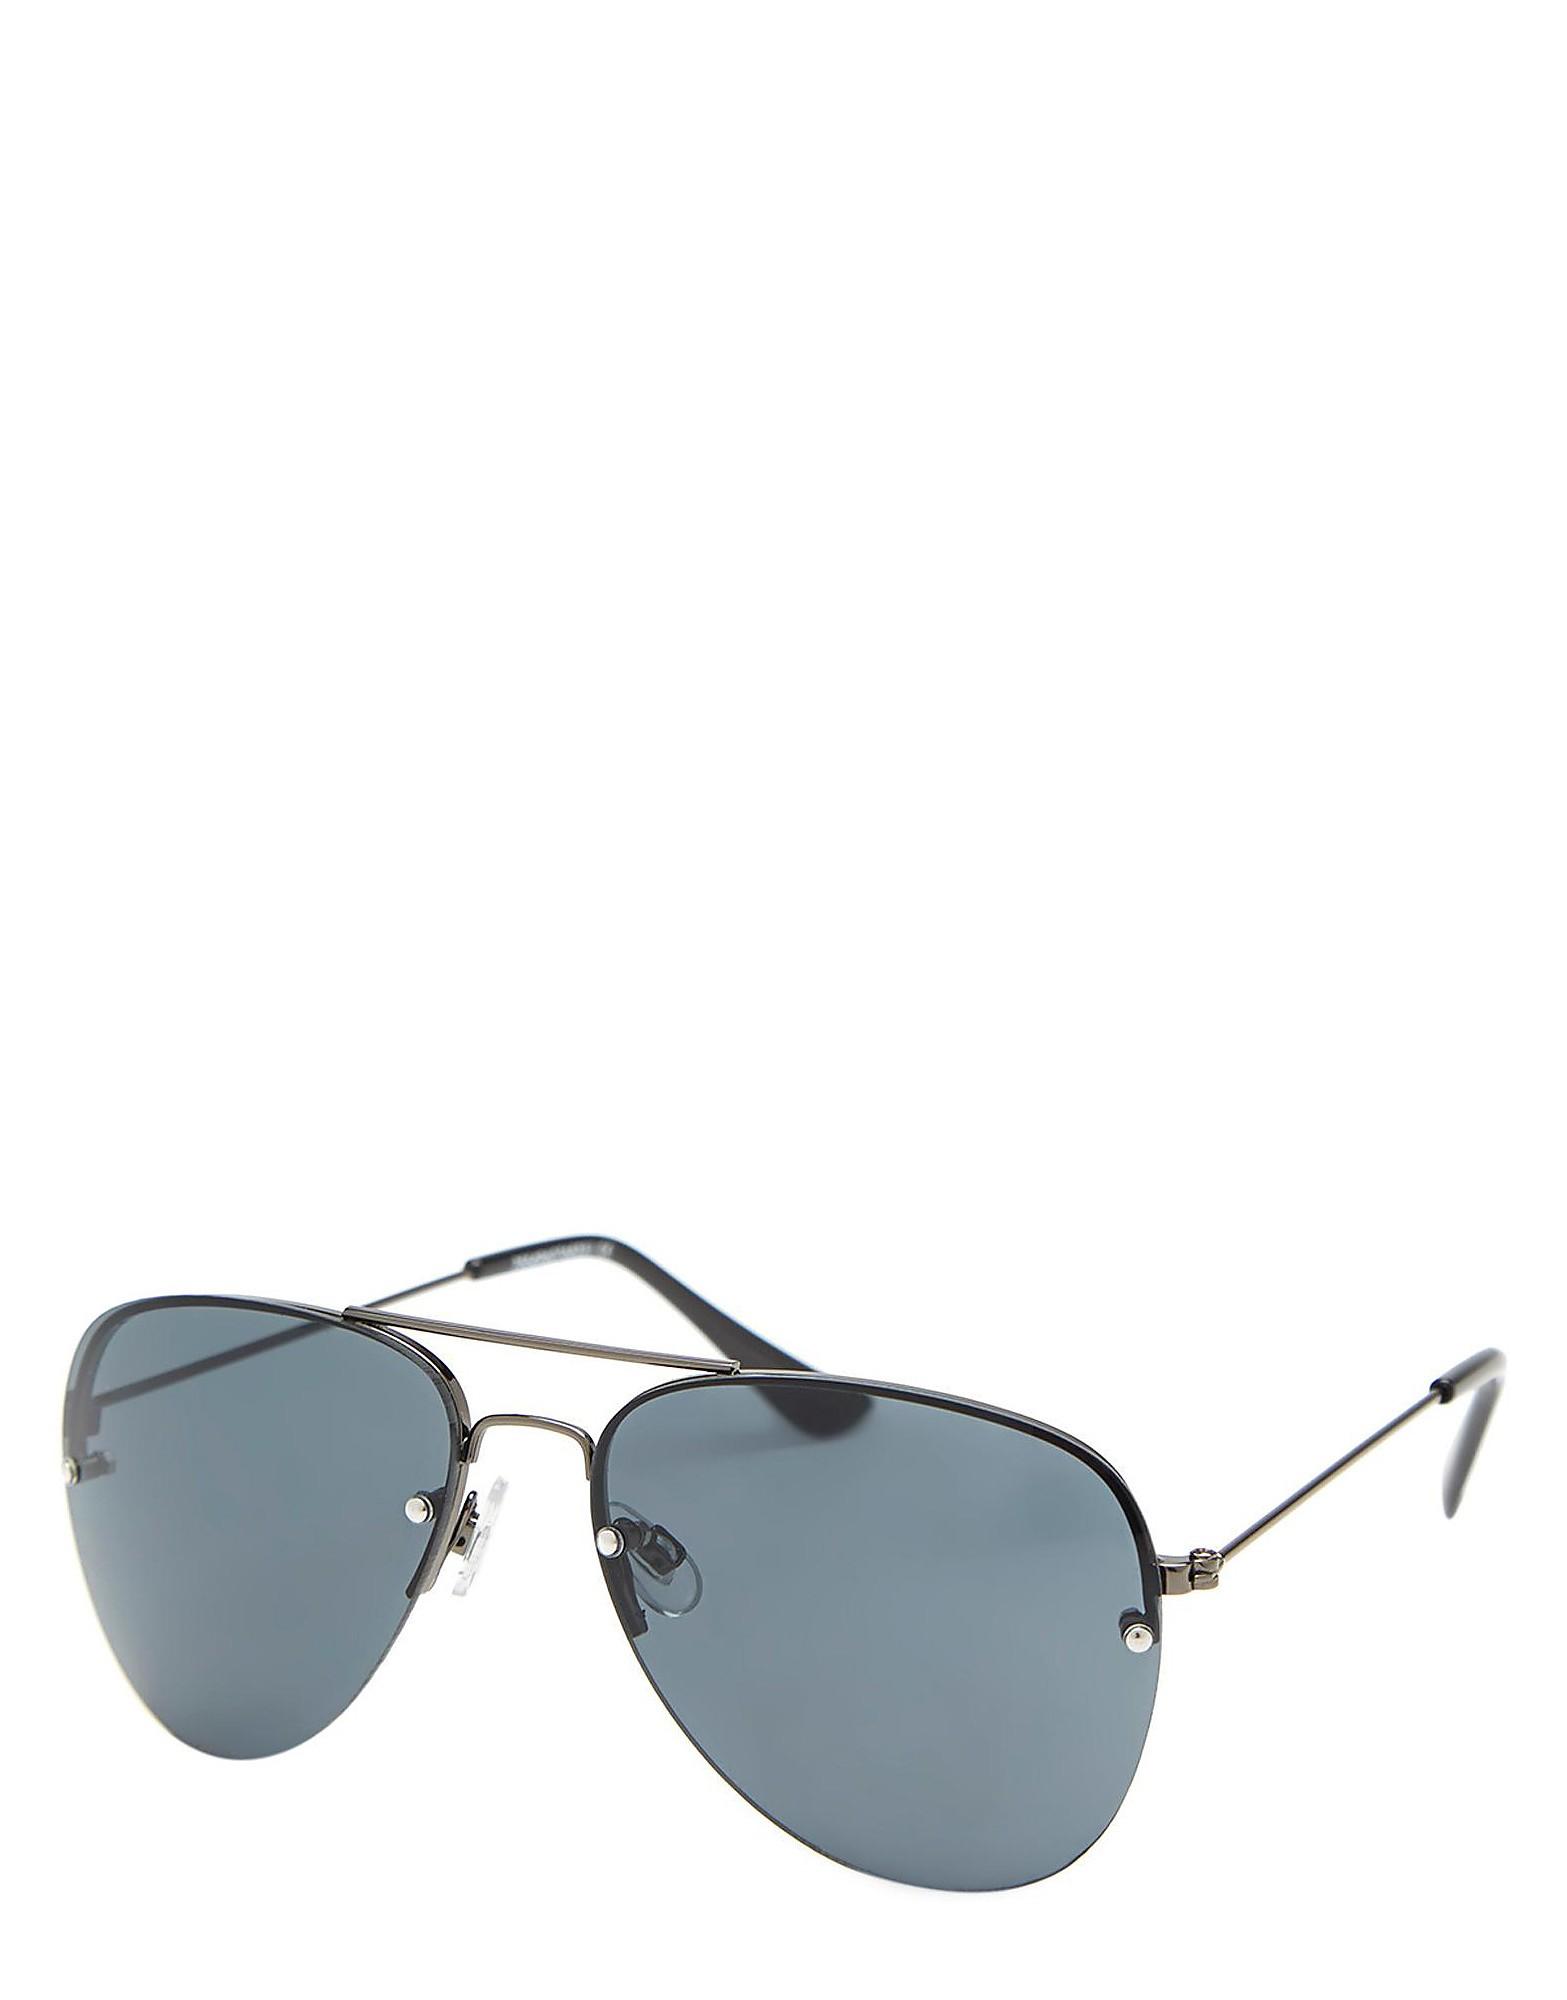 Brookhaven Knightsbridge Sunglasses - Only at JD - Black - Mens, Black